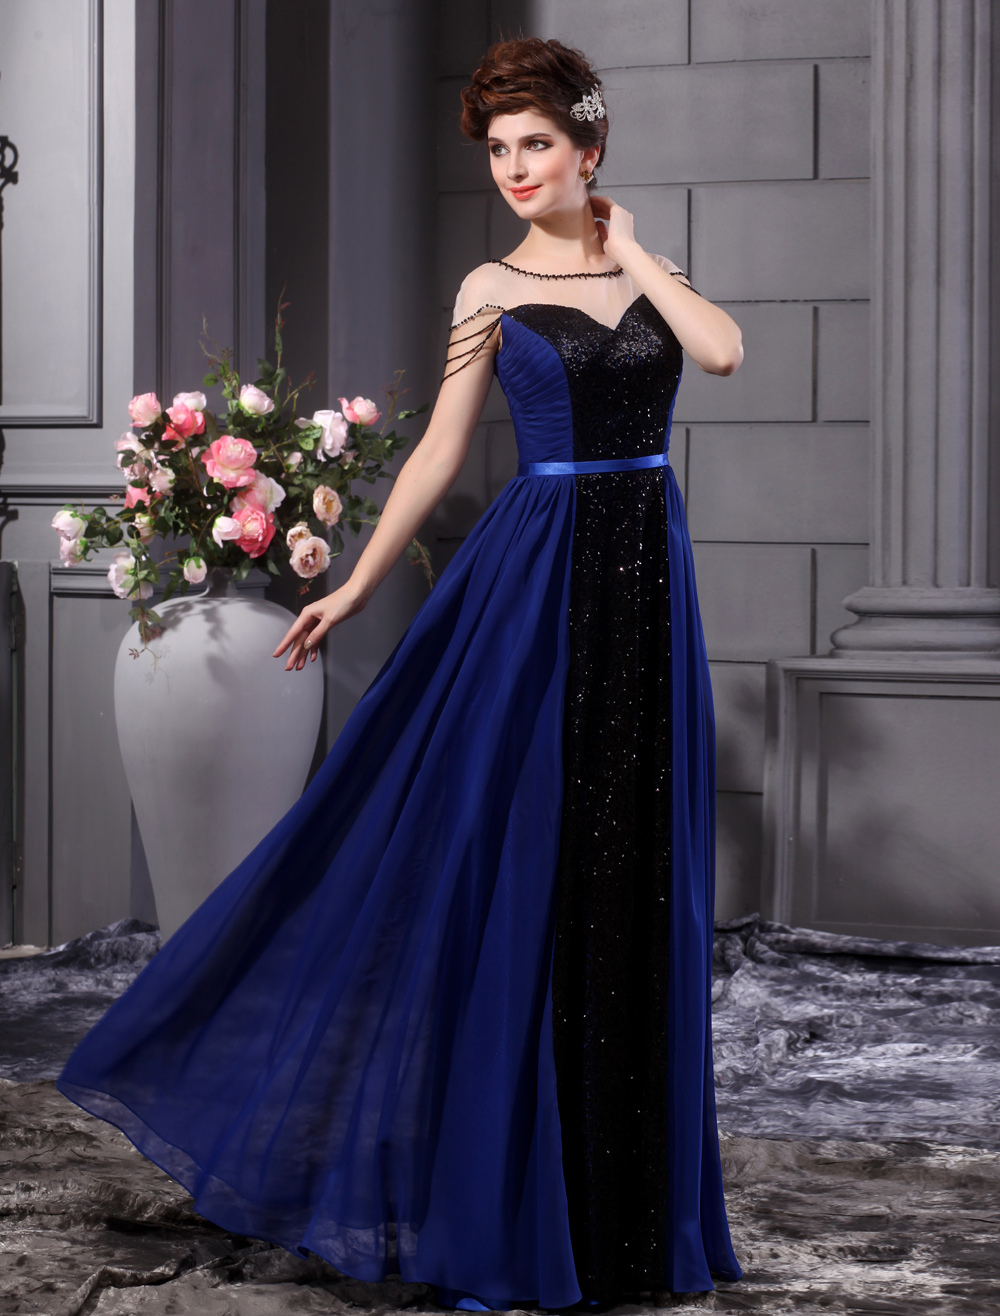 A-line Royal Blue Chiffon Sequin Floor-Length Fashion Prom Dress Milanoo